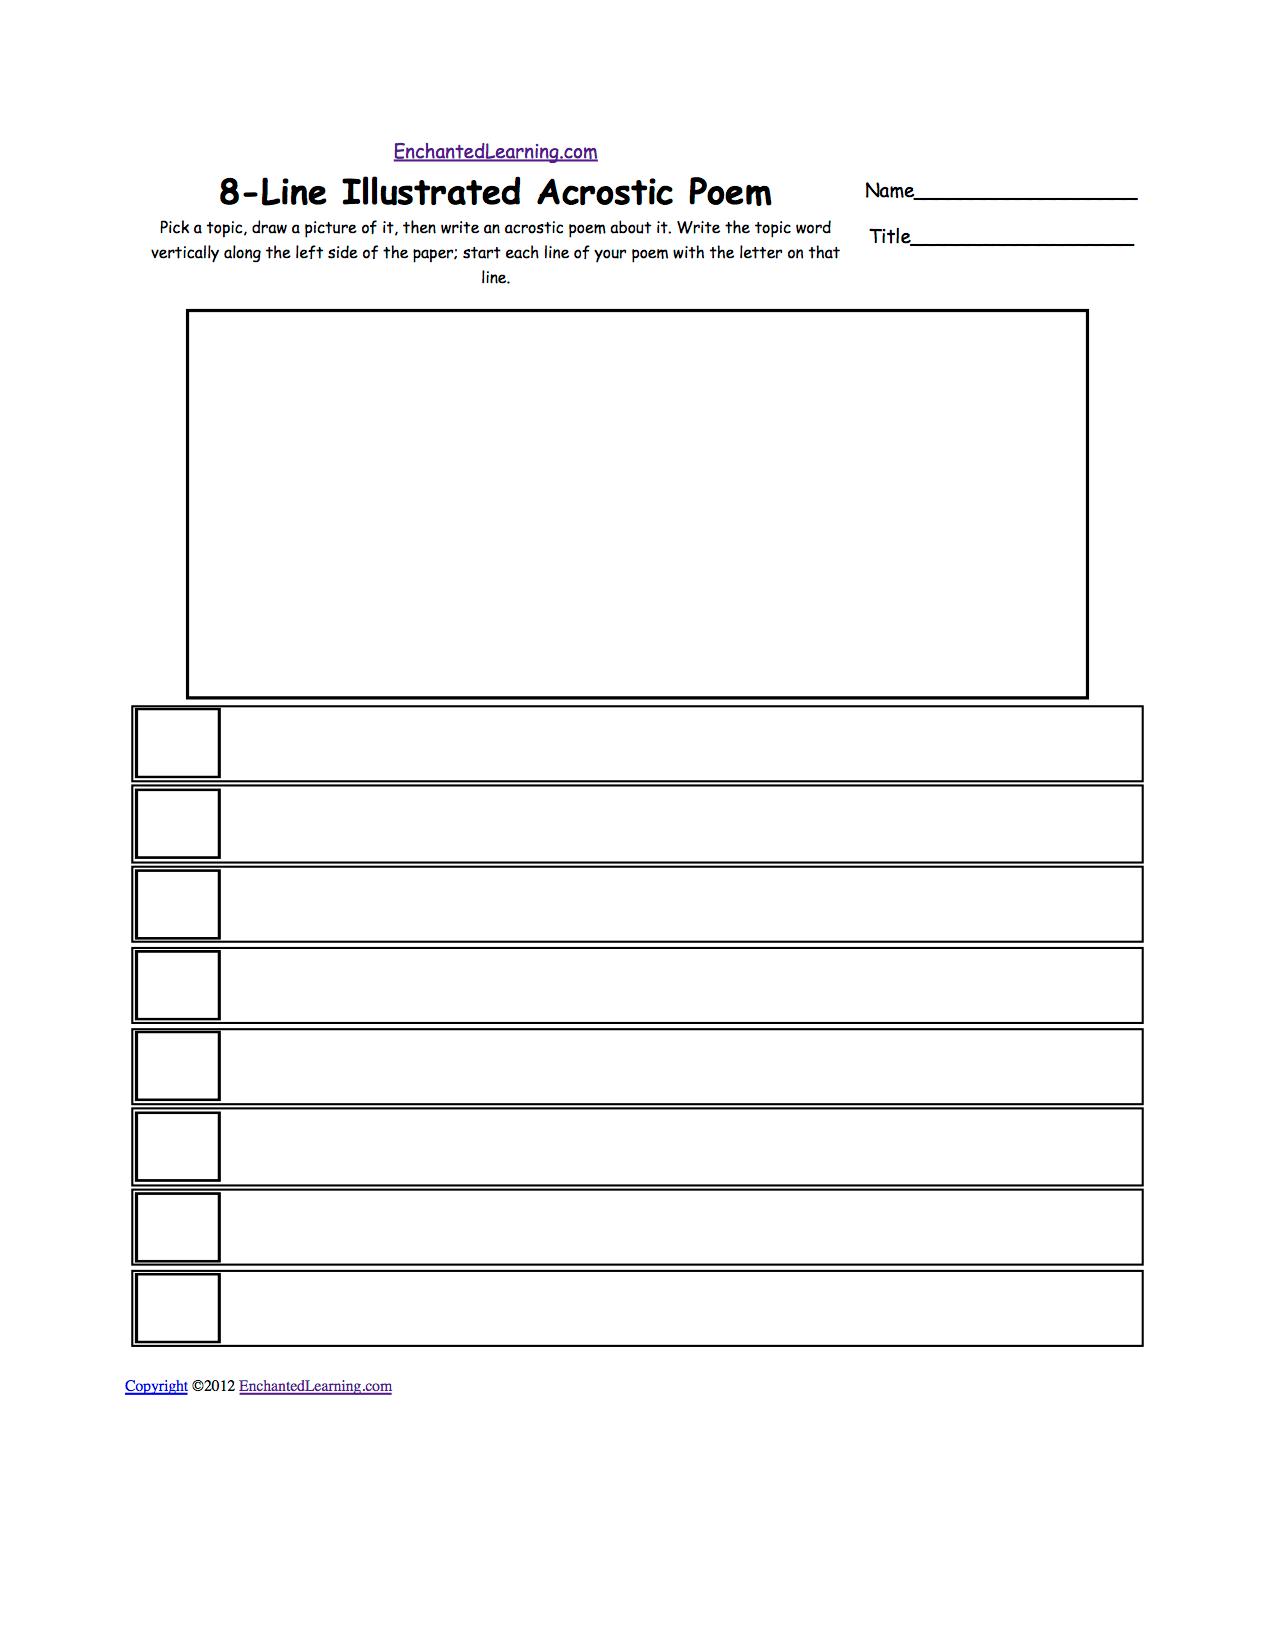 Blank Illustrated Acrostic Poem Worksheets Worksheet